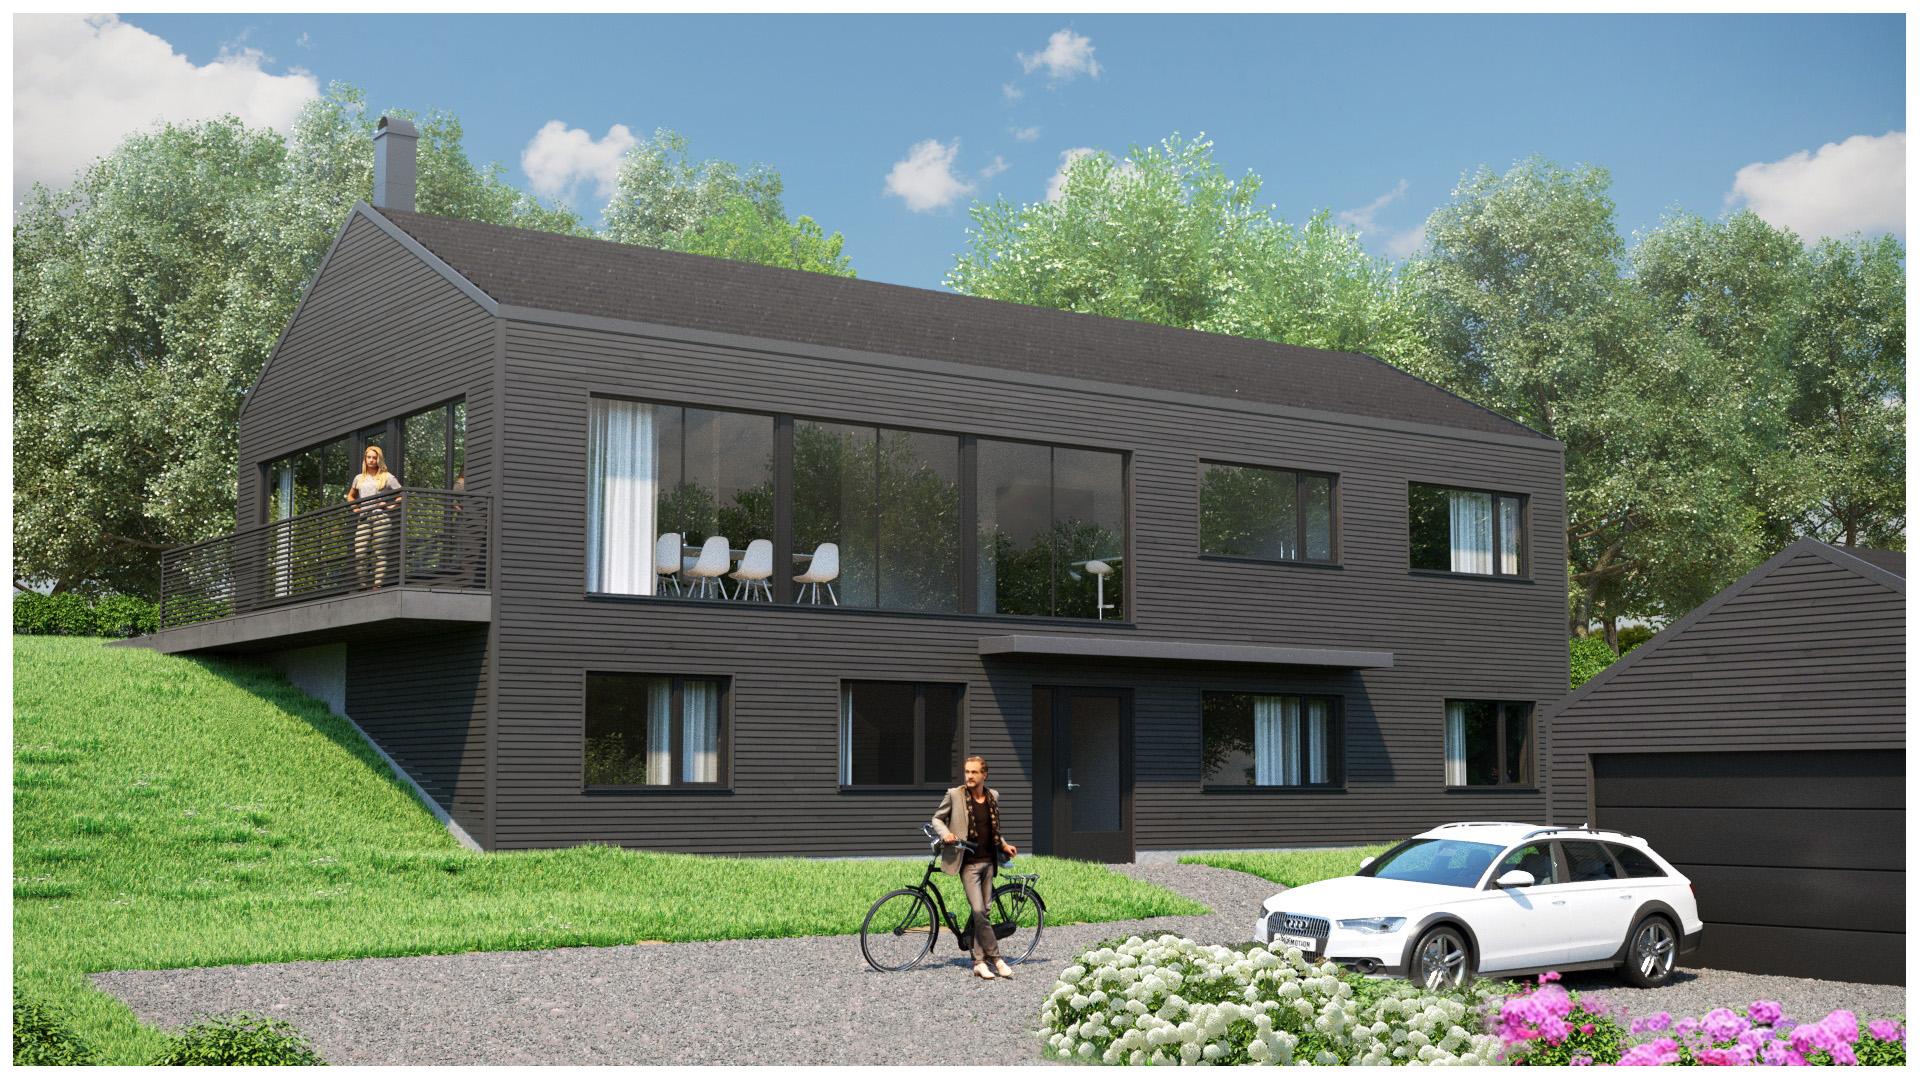 Vektaveien 12 fasade 1b.jpg